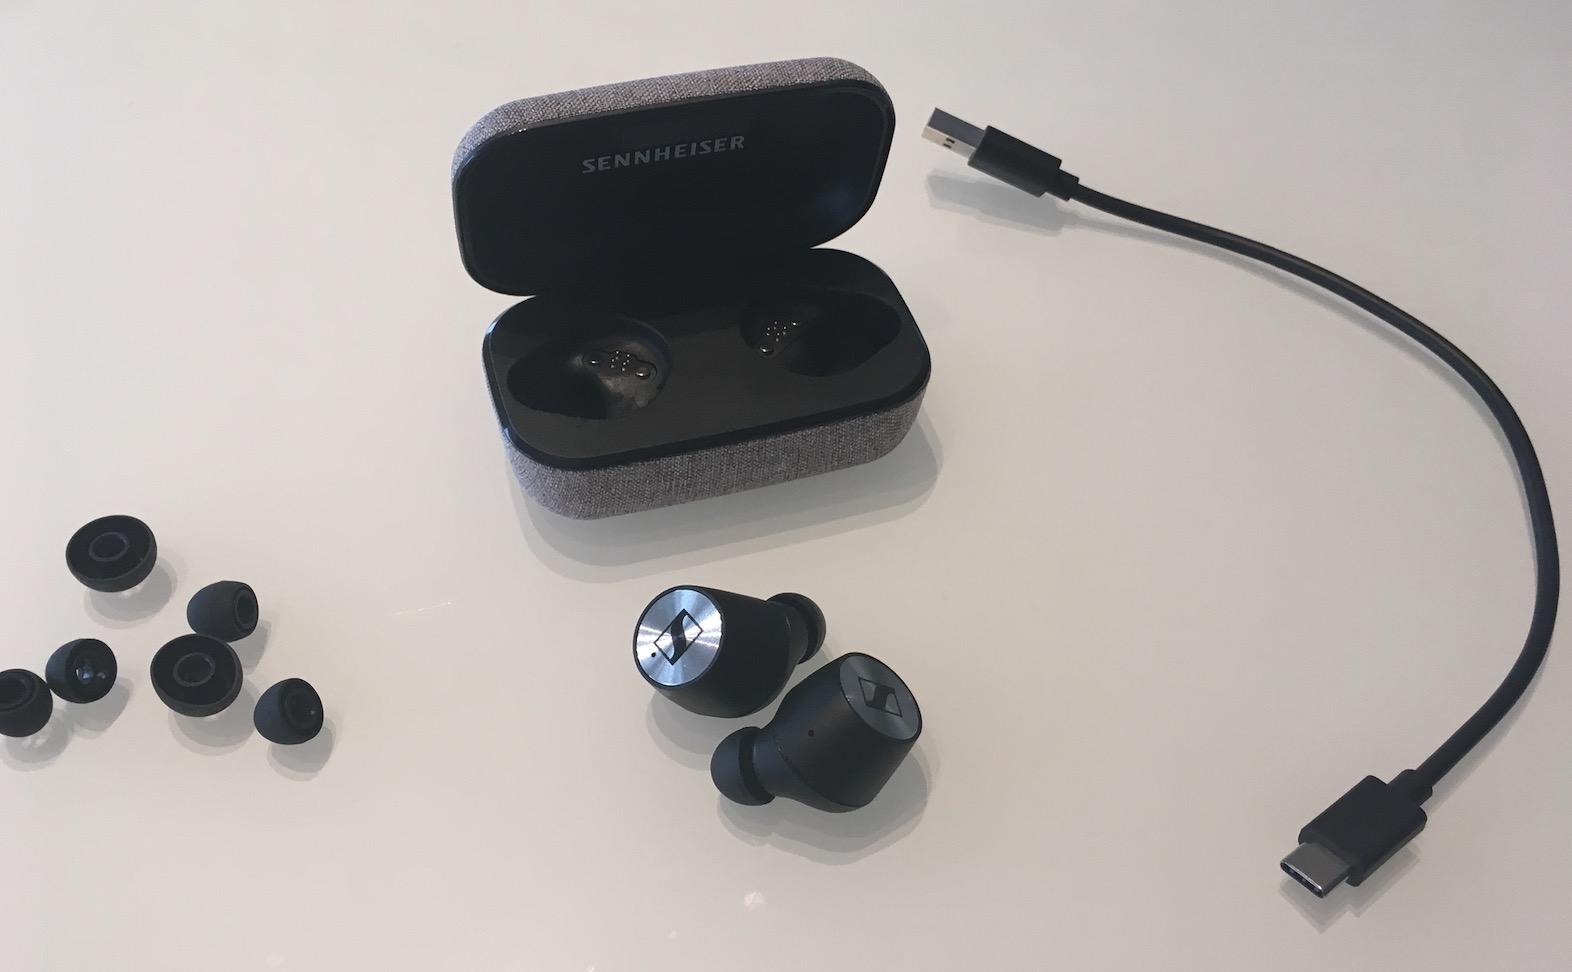 Accessoires fournis avec les Momentum True Wireless